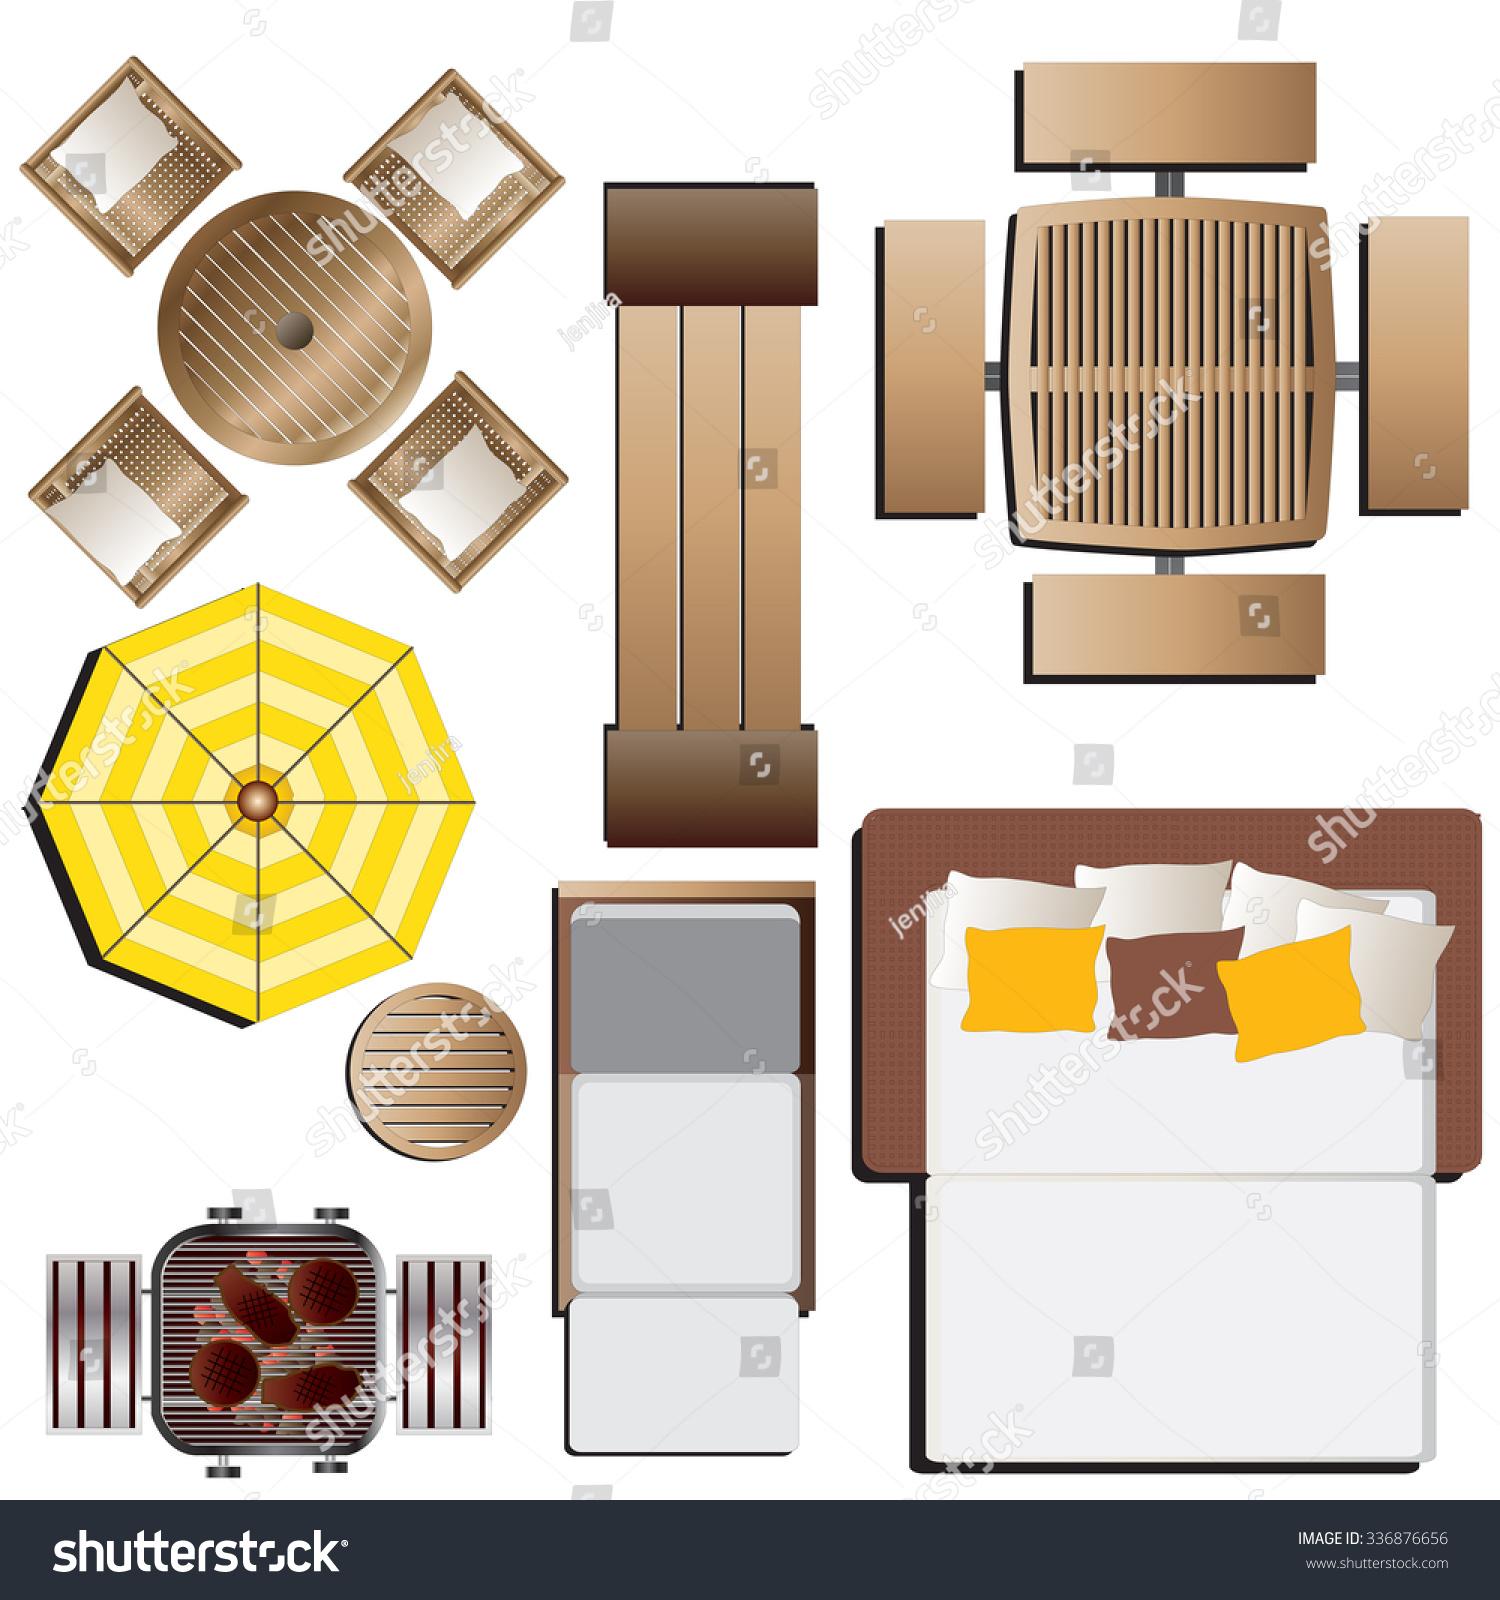 Furniture top view images - Outdoor Furniture Top View Set 15 For Landscape Design Vector Illustration